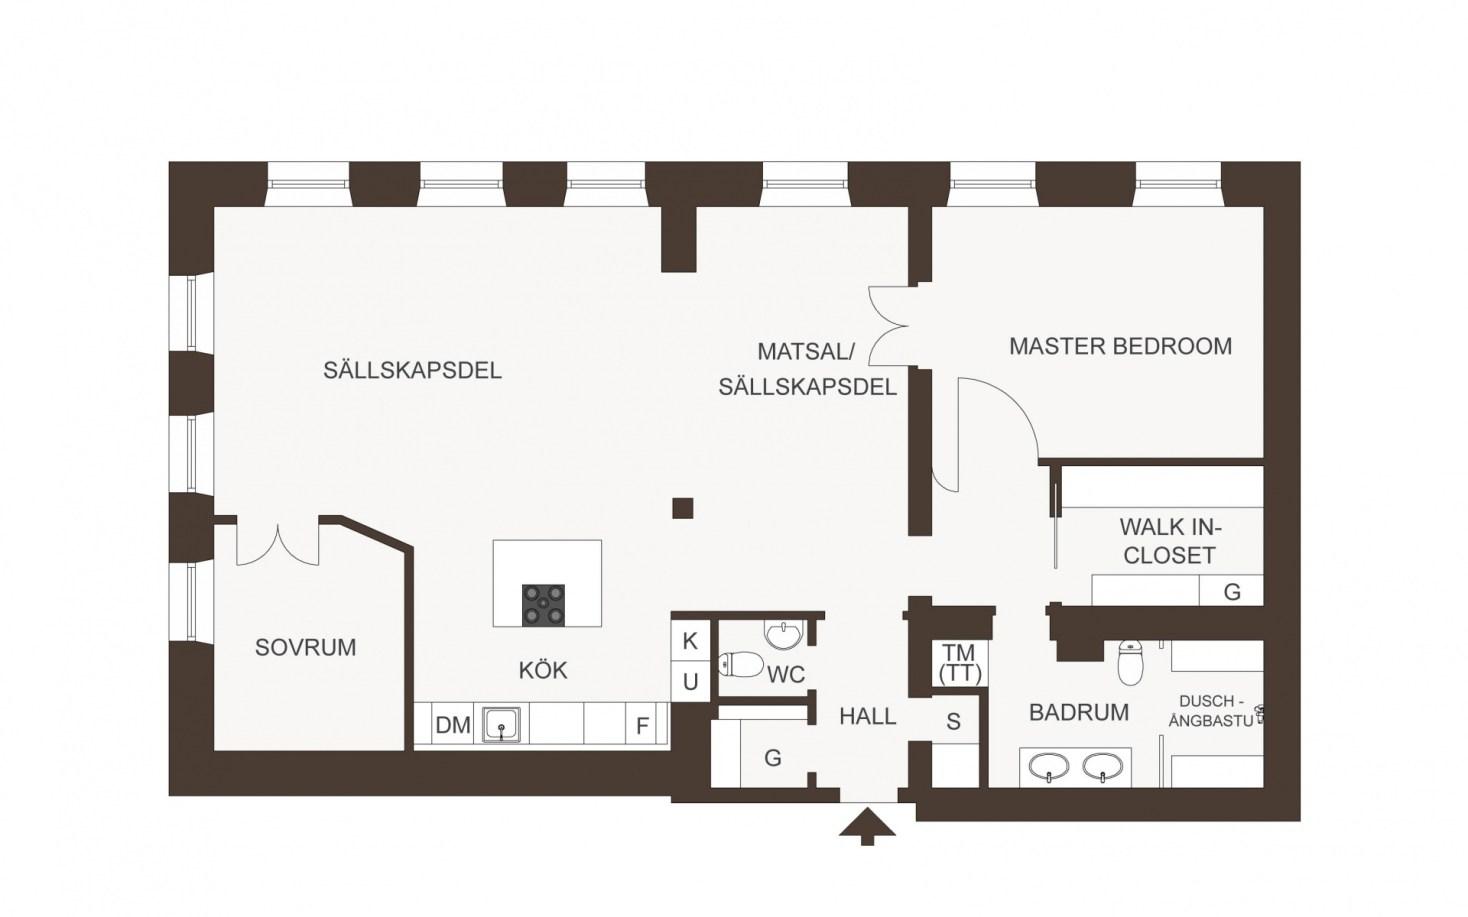 планировка квартиры 128 квм